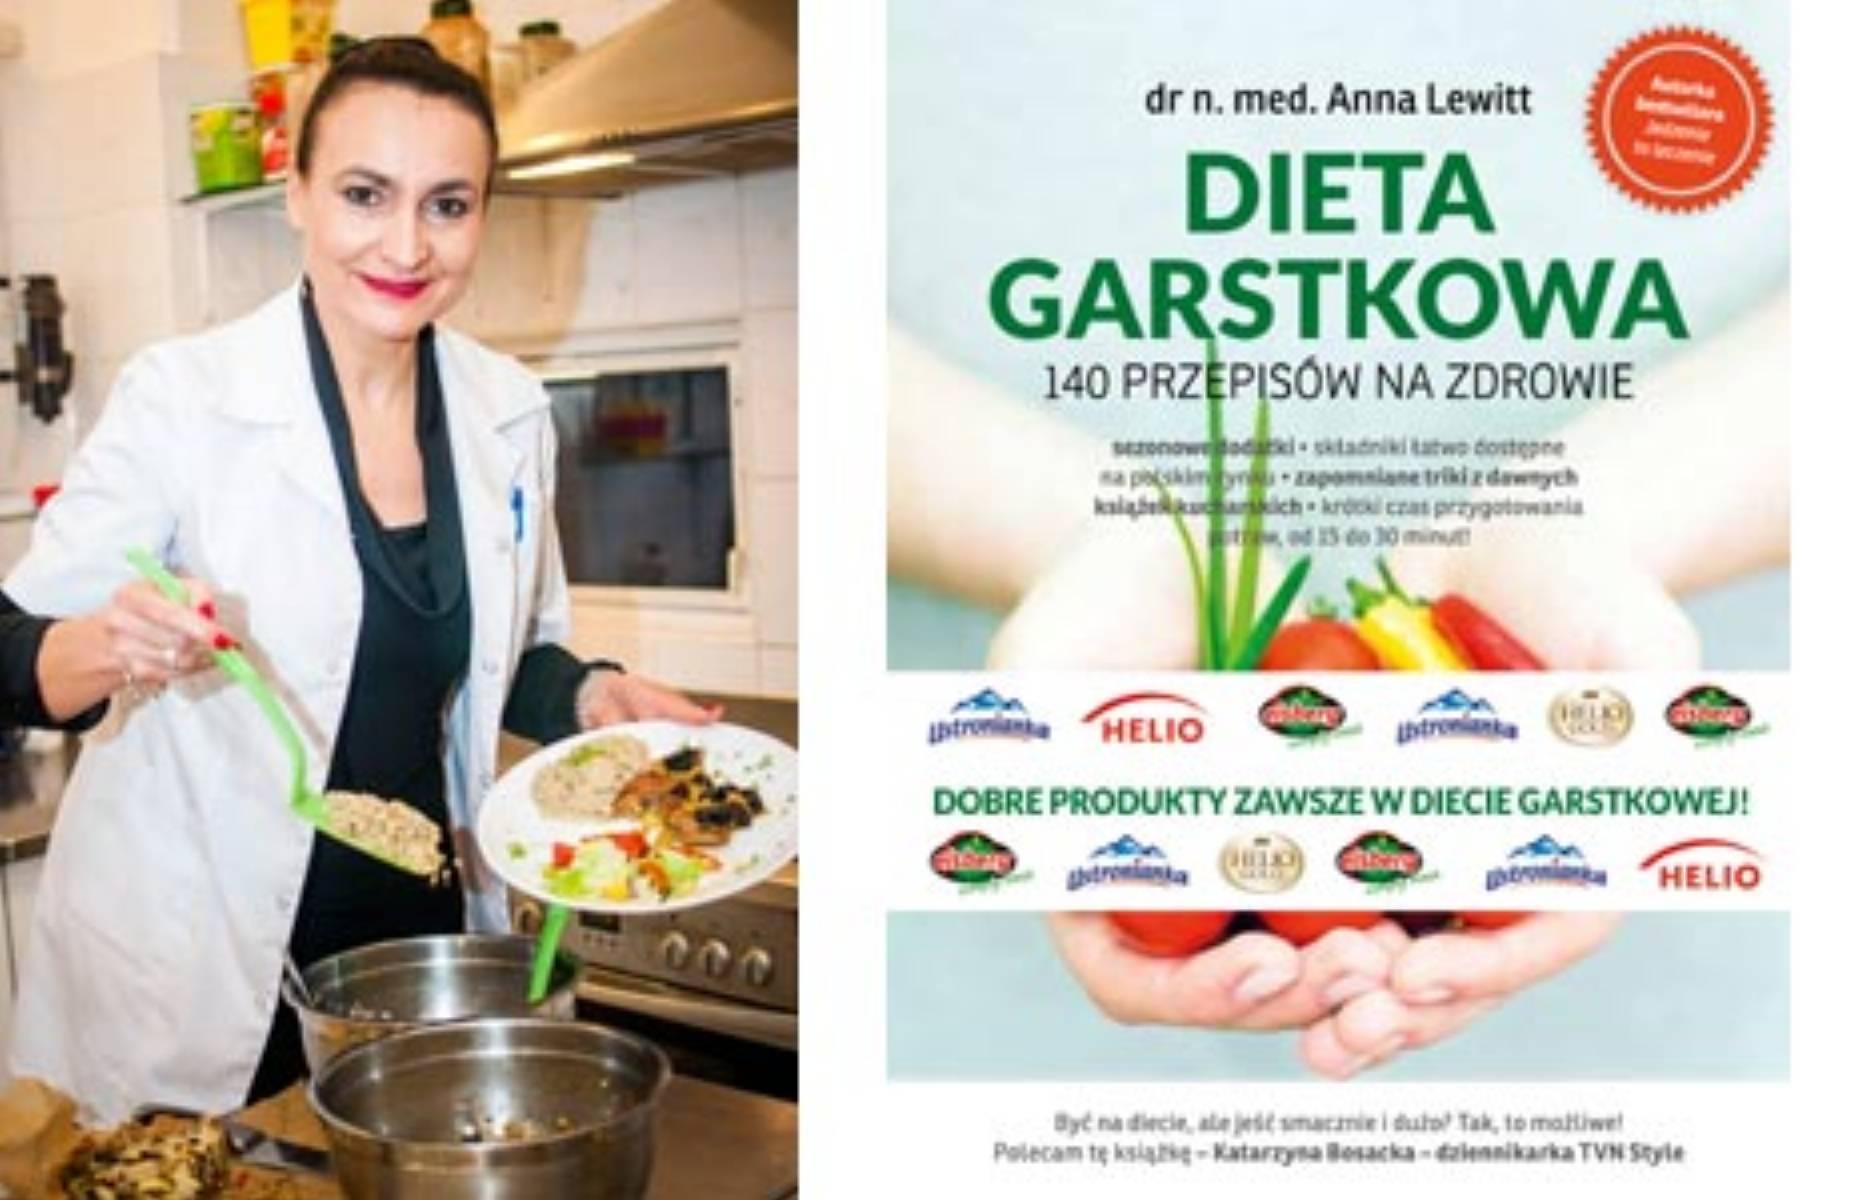 Konkurs-Dieta-Garstkowa-Anna-Lewitt